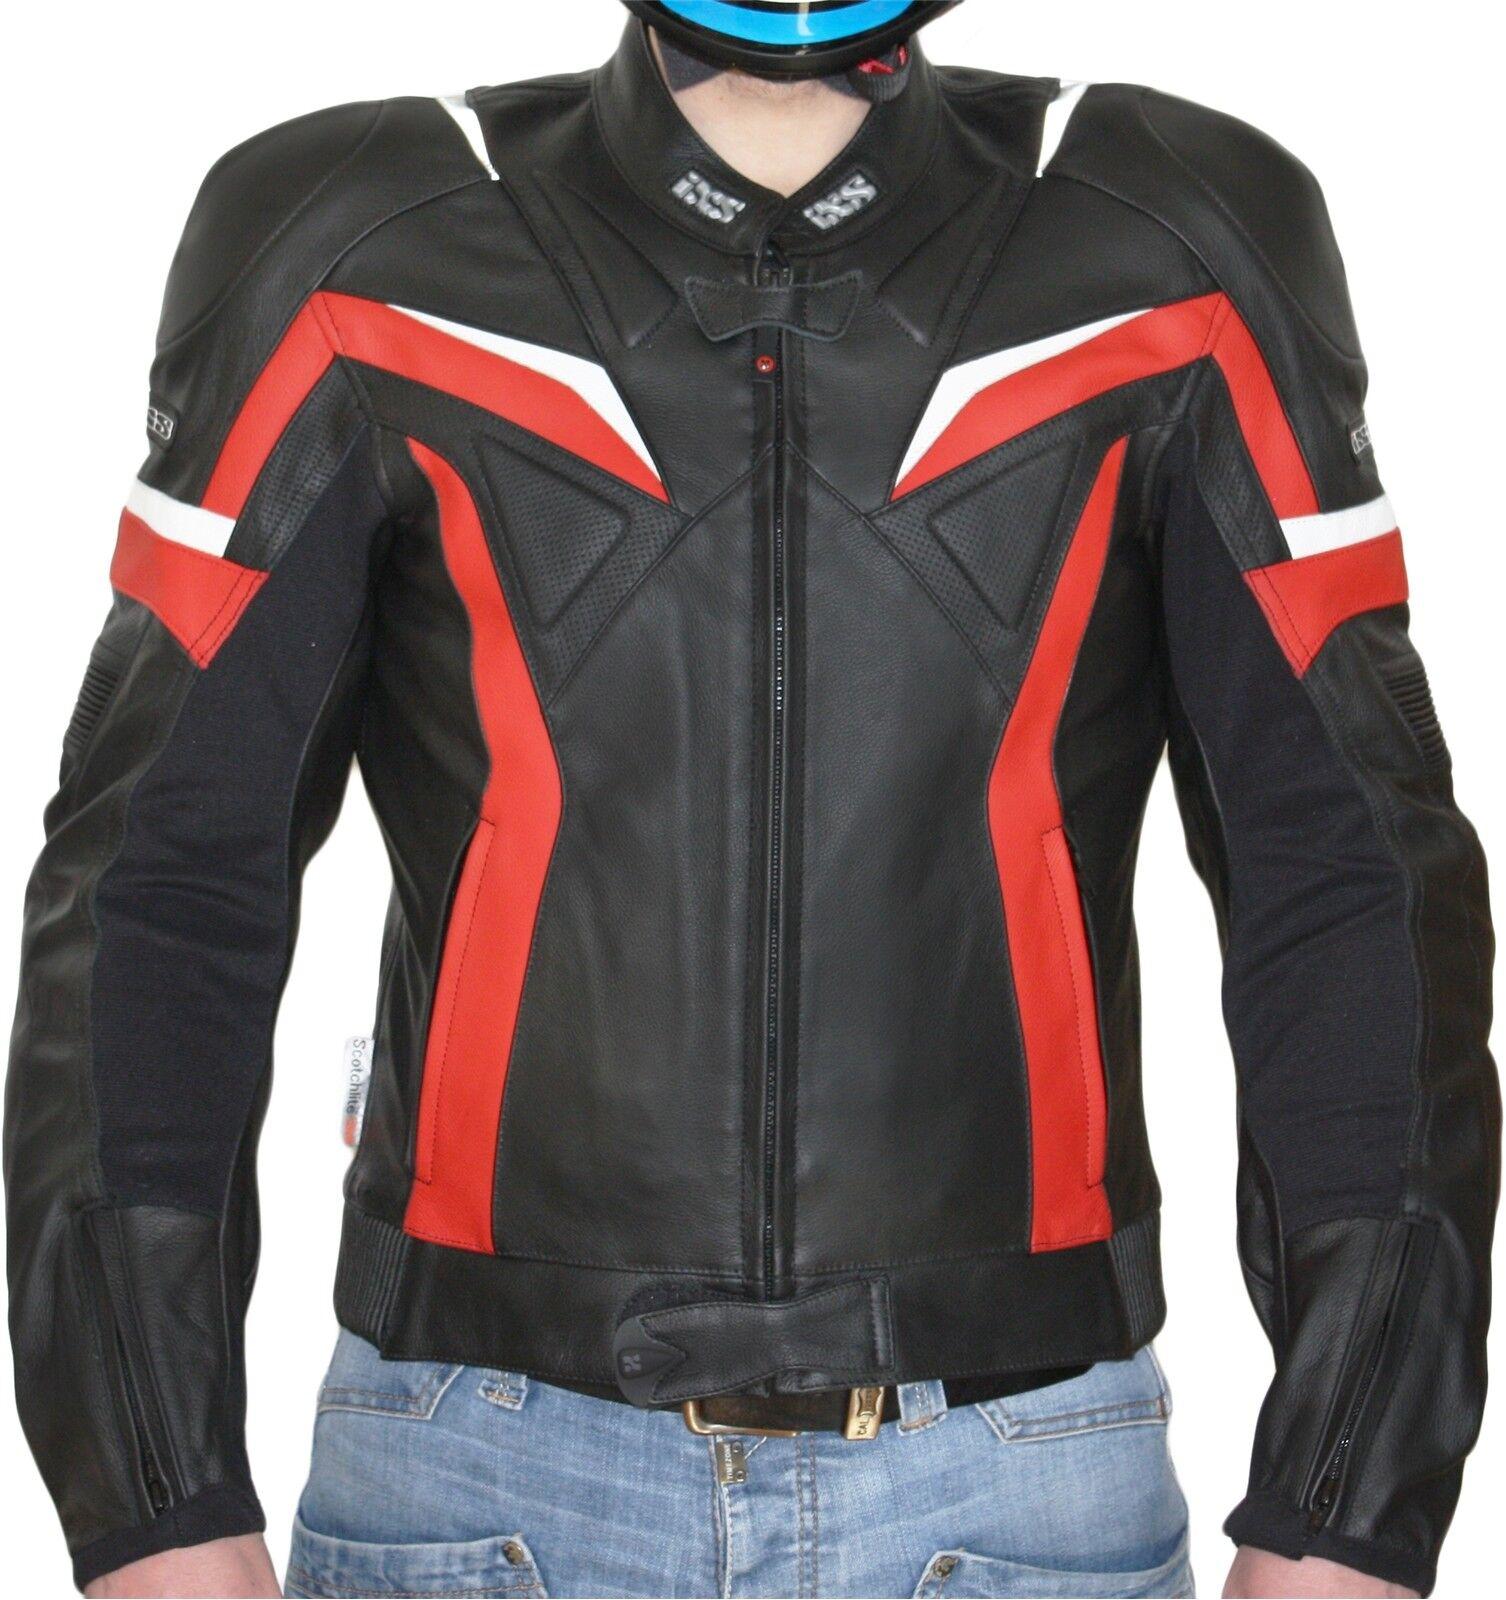 Reducido IXS RX black red Chaqueta  de cuero para hombre SPORT RACING  classic fashion